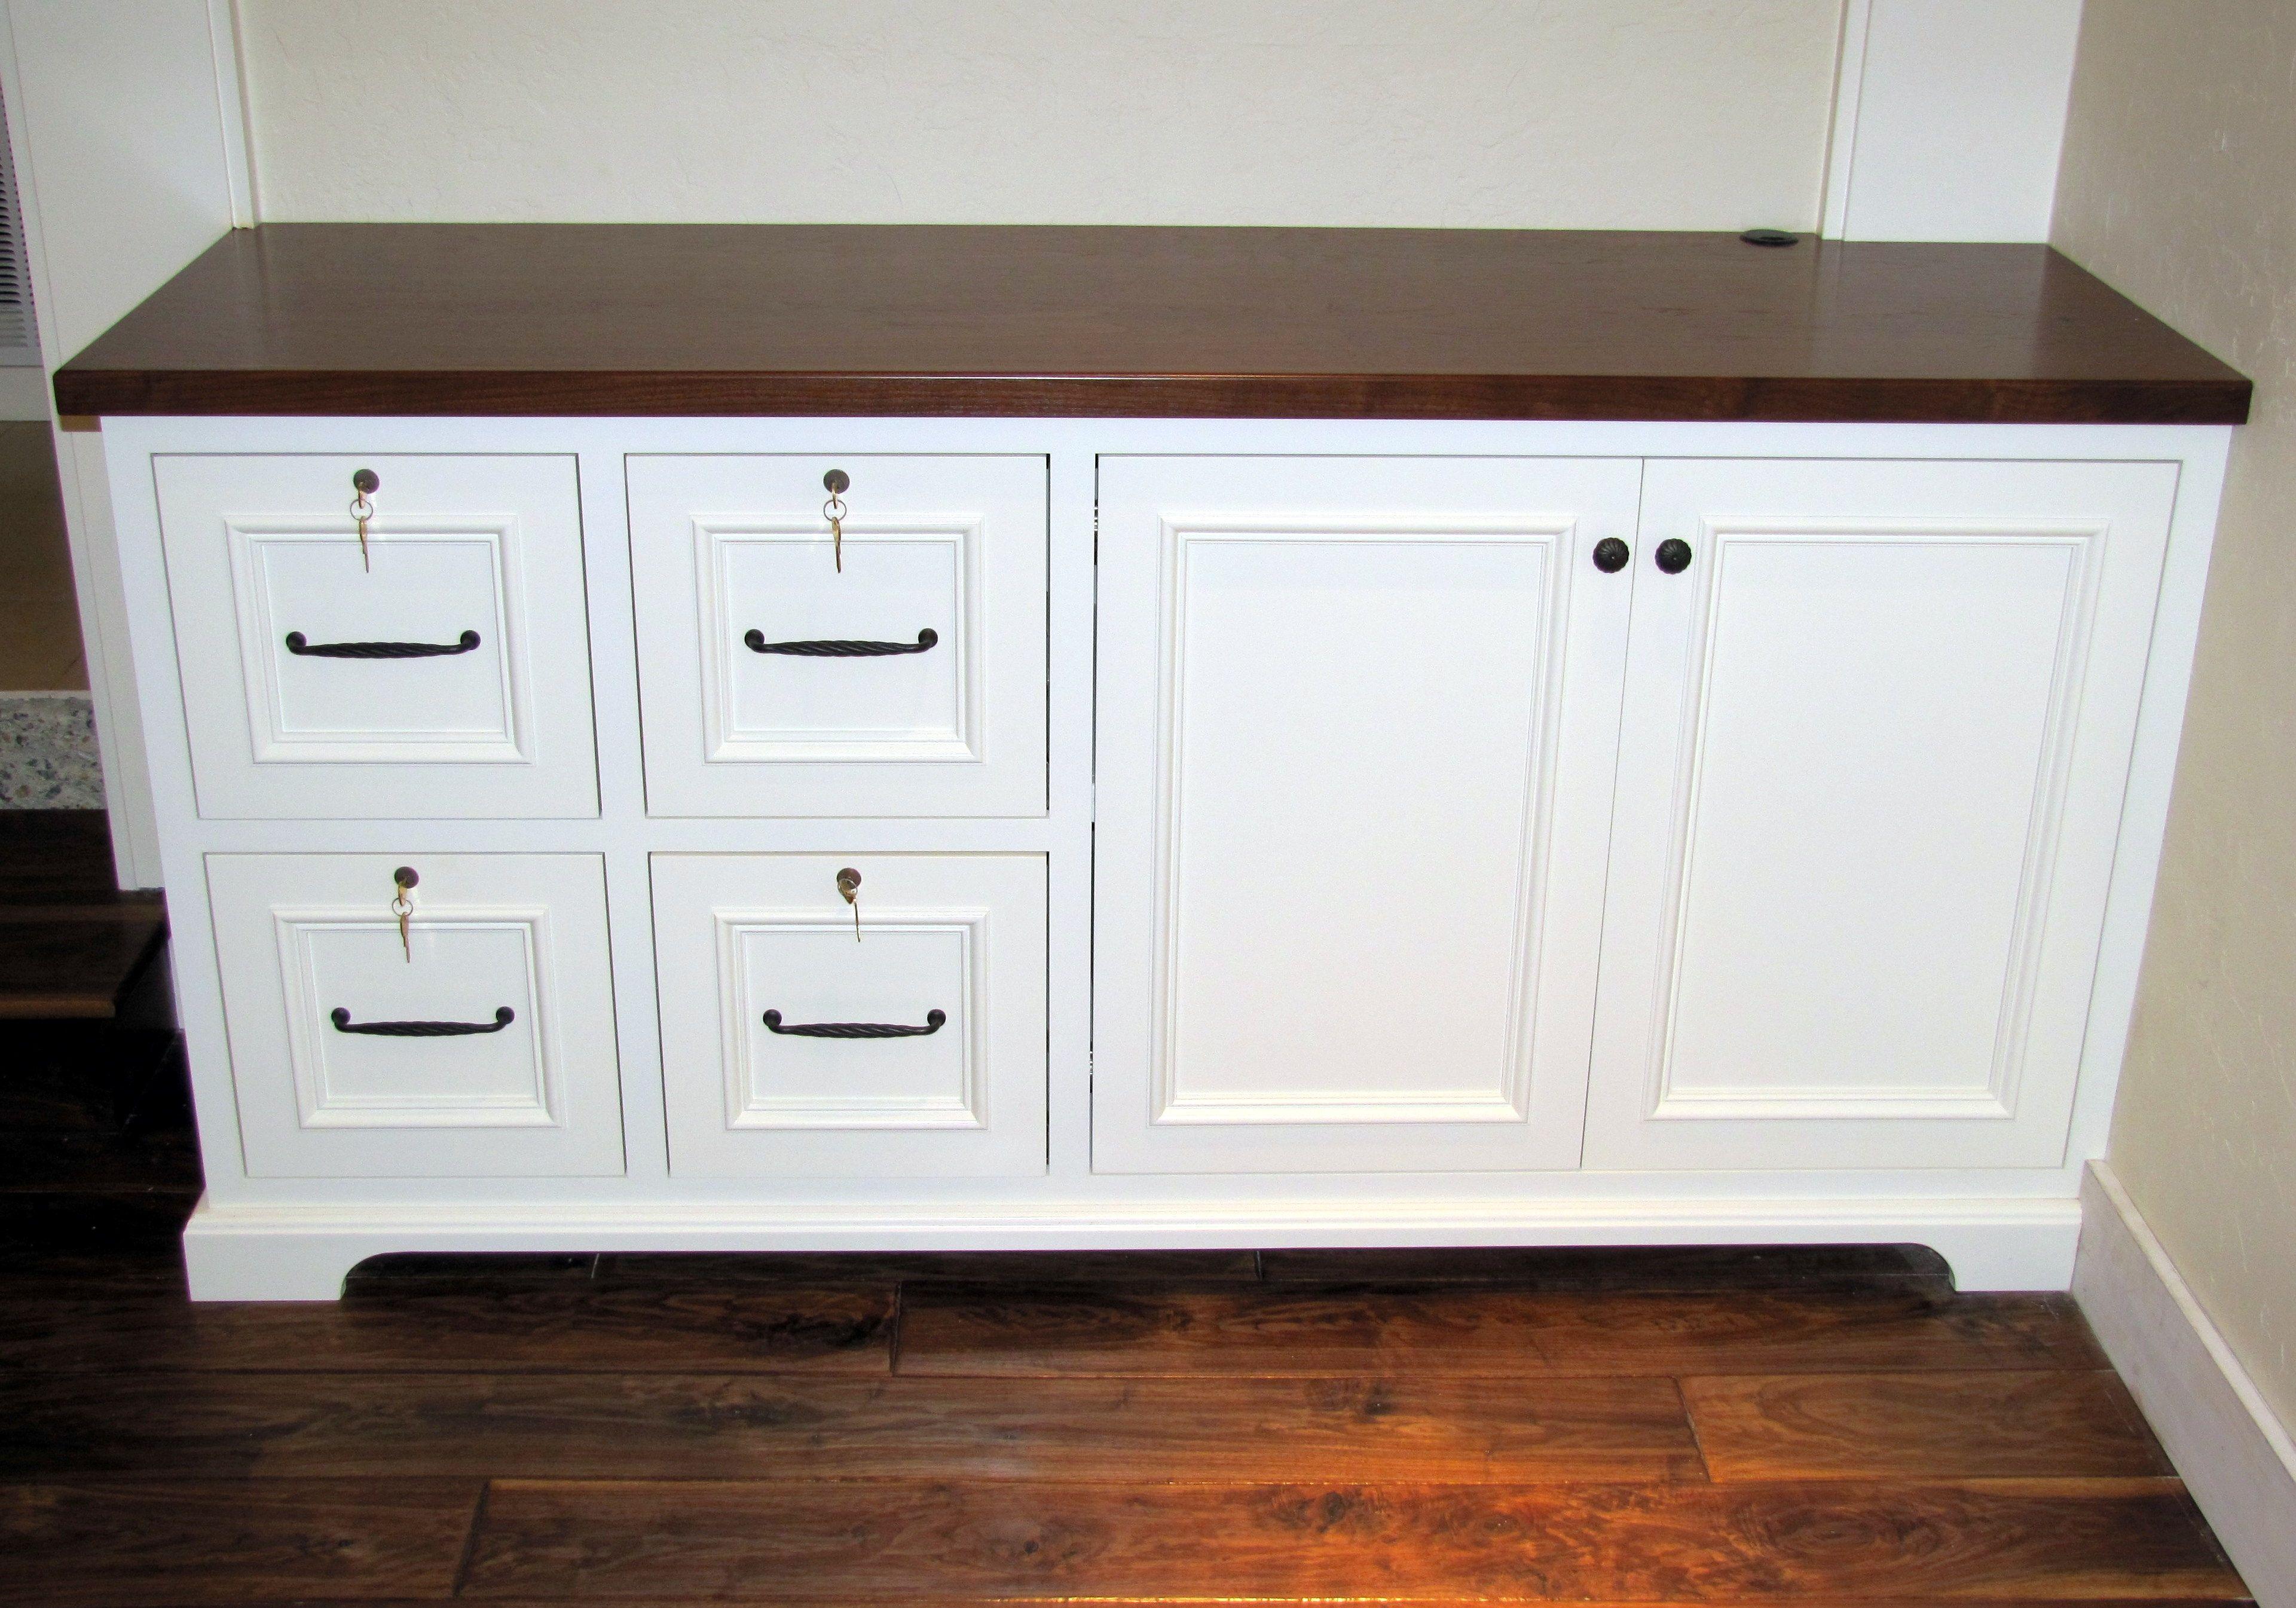 Inset Cabinet Doors Kitchen | Inset cabinets, Custom ...